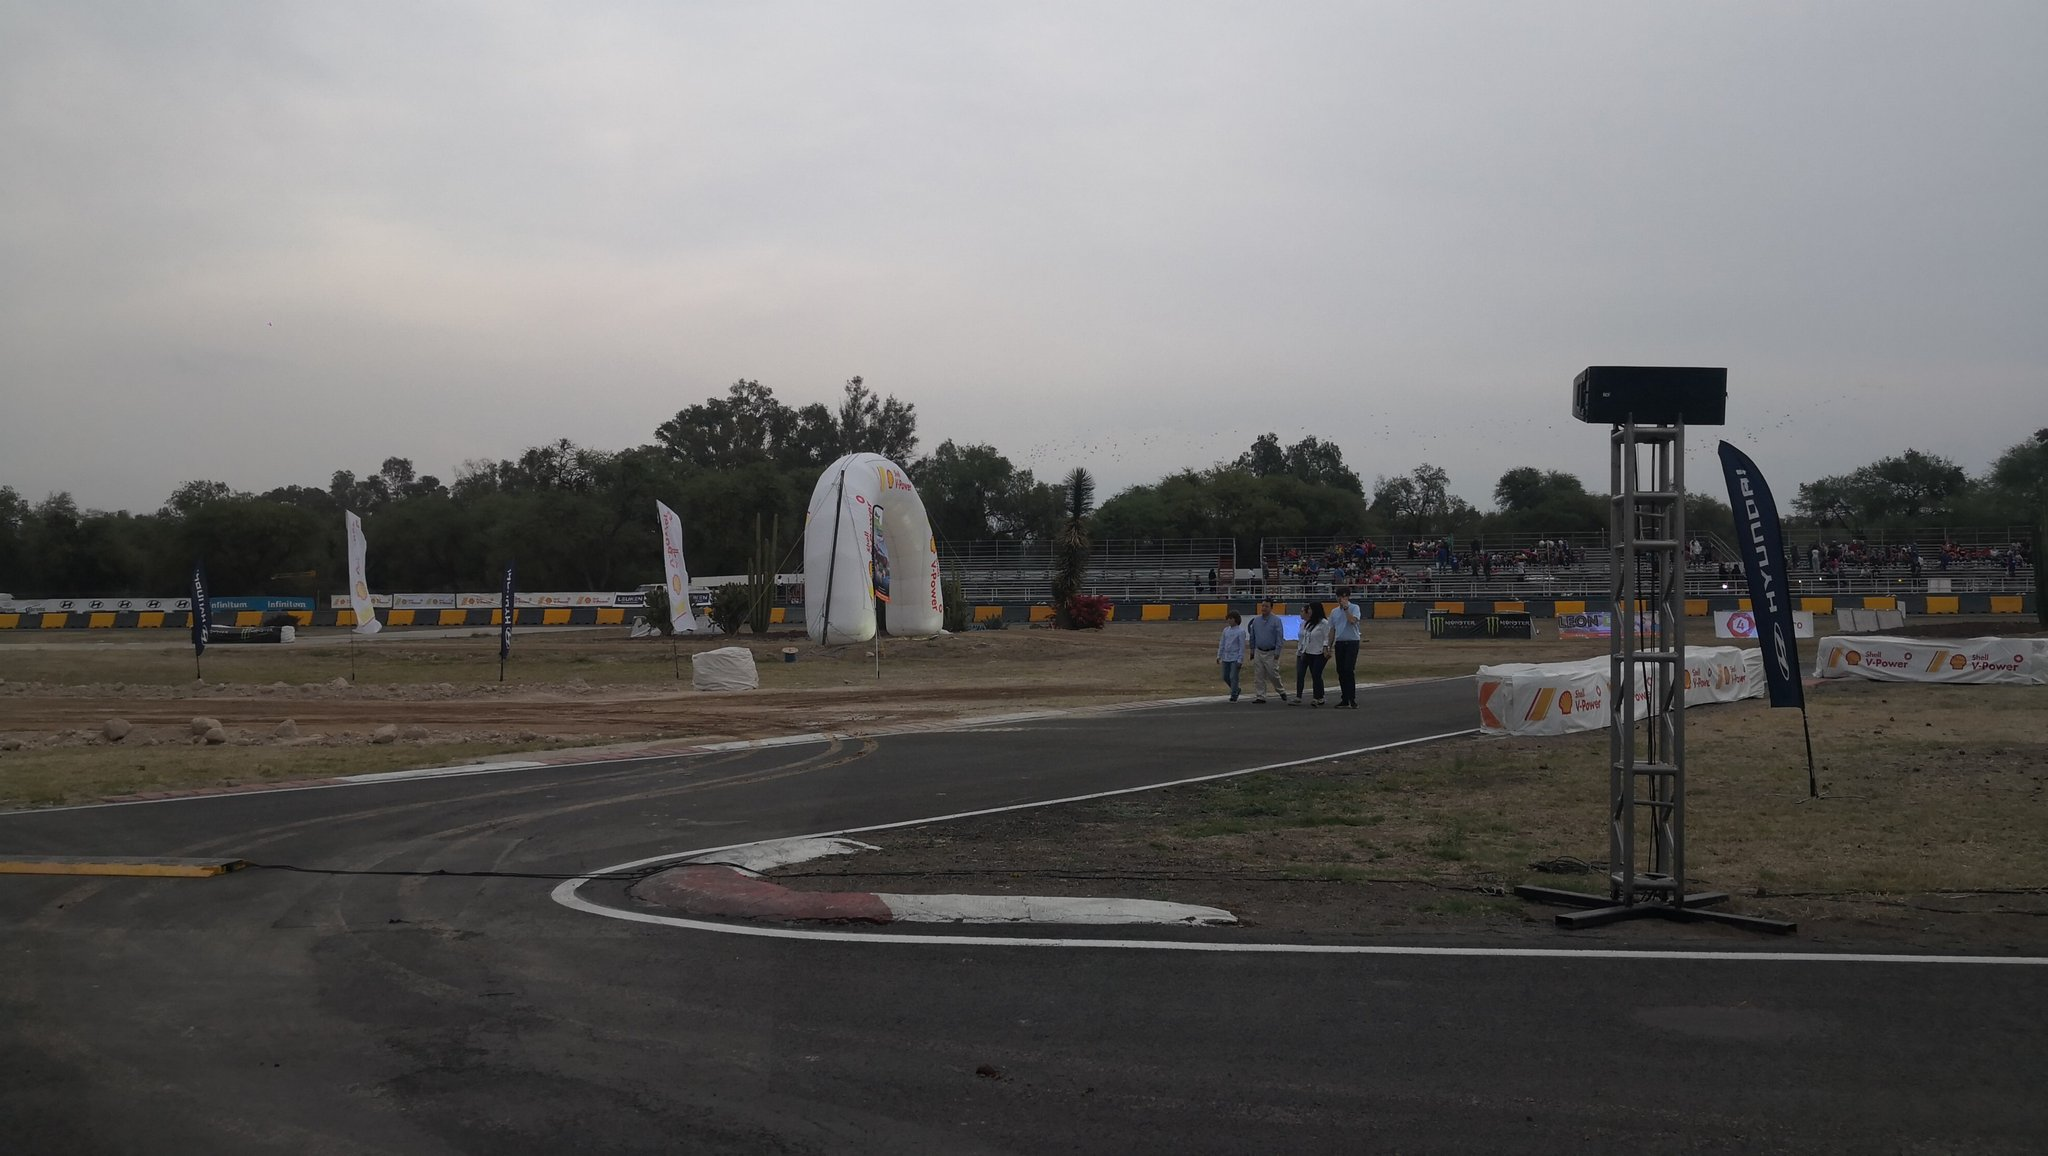 WRC: 17º Rallye Guanajuato Corona - México [12-15 Marzo] - Página 4 ETB_DBeXgAEIq2J?format=jpg&name=large